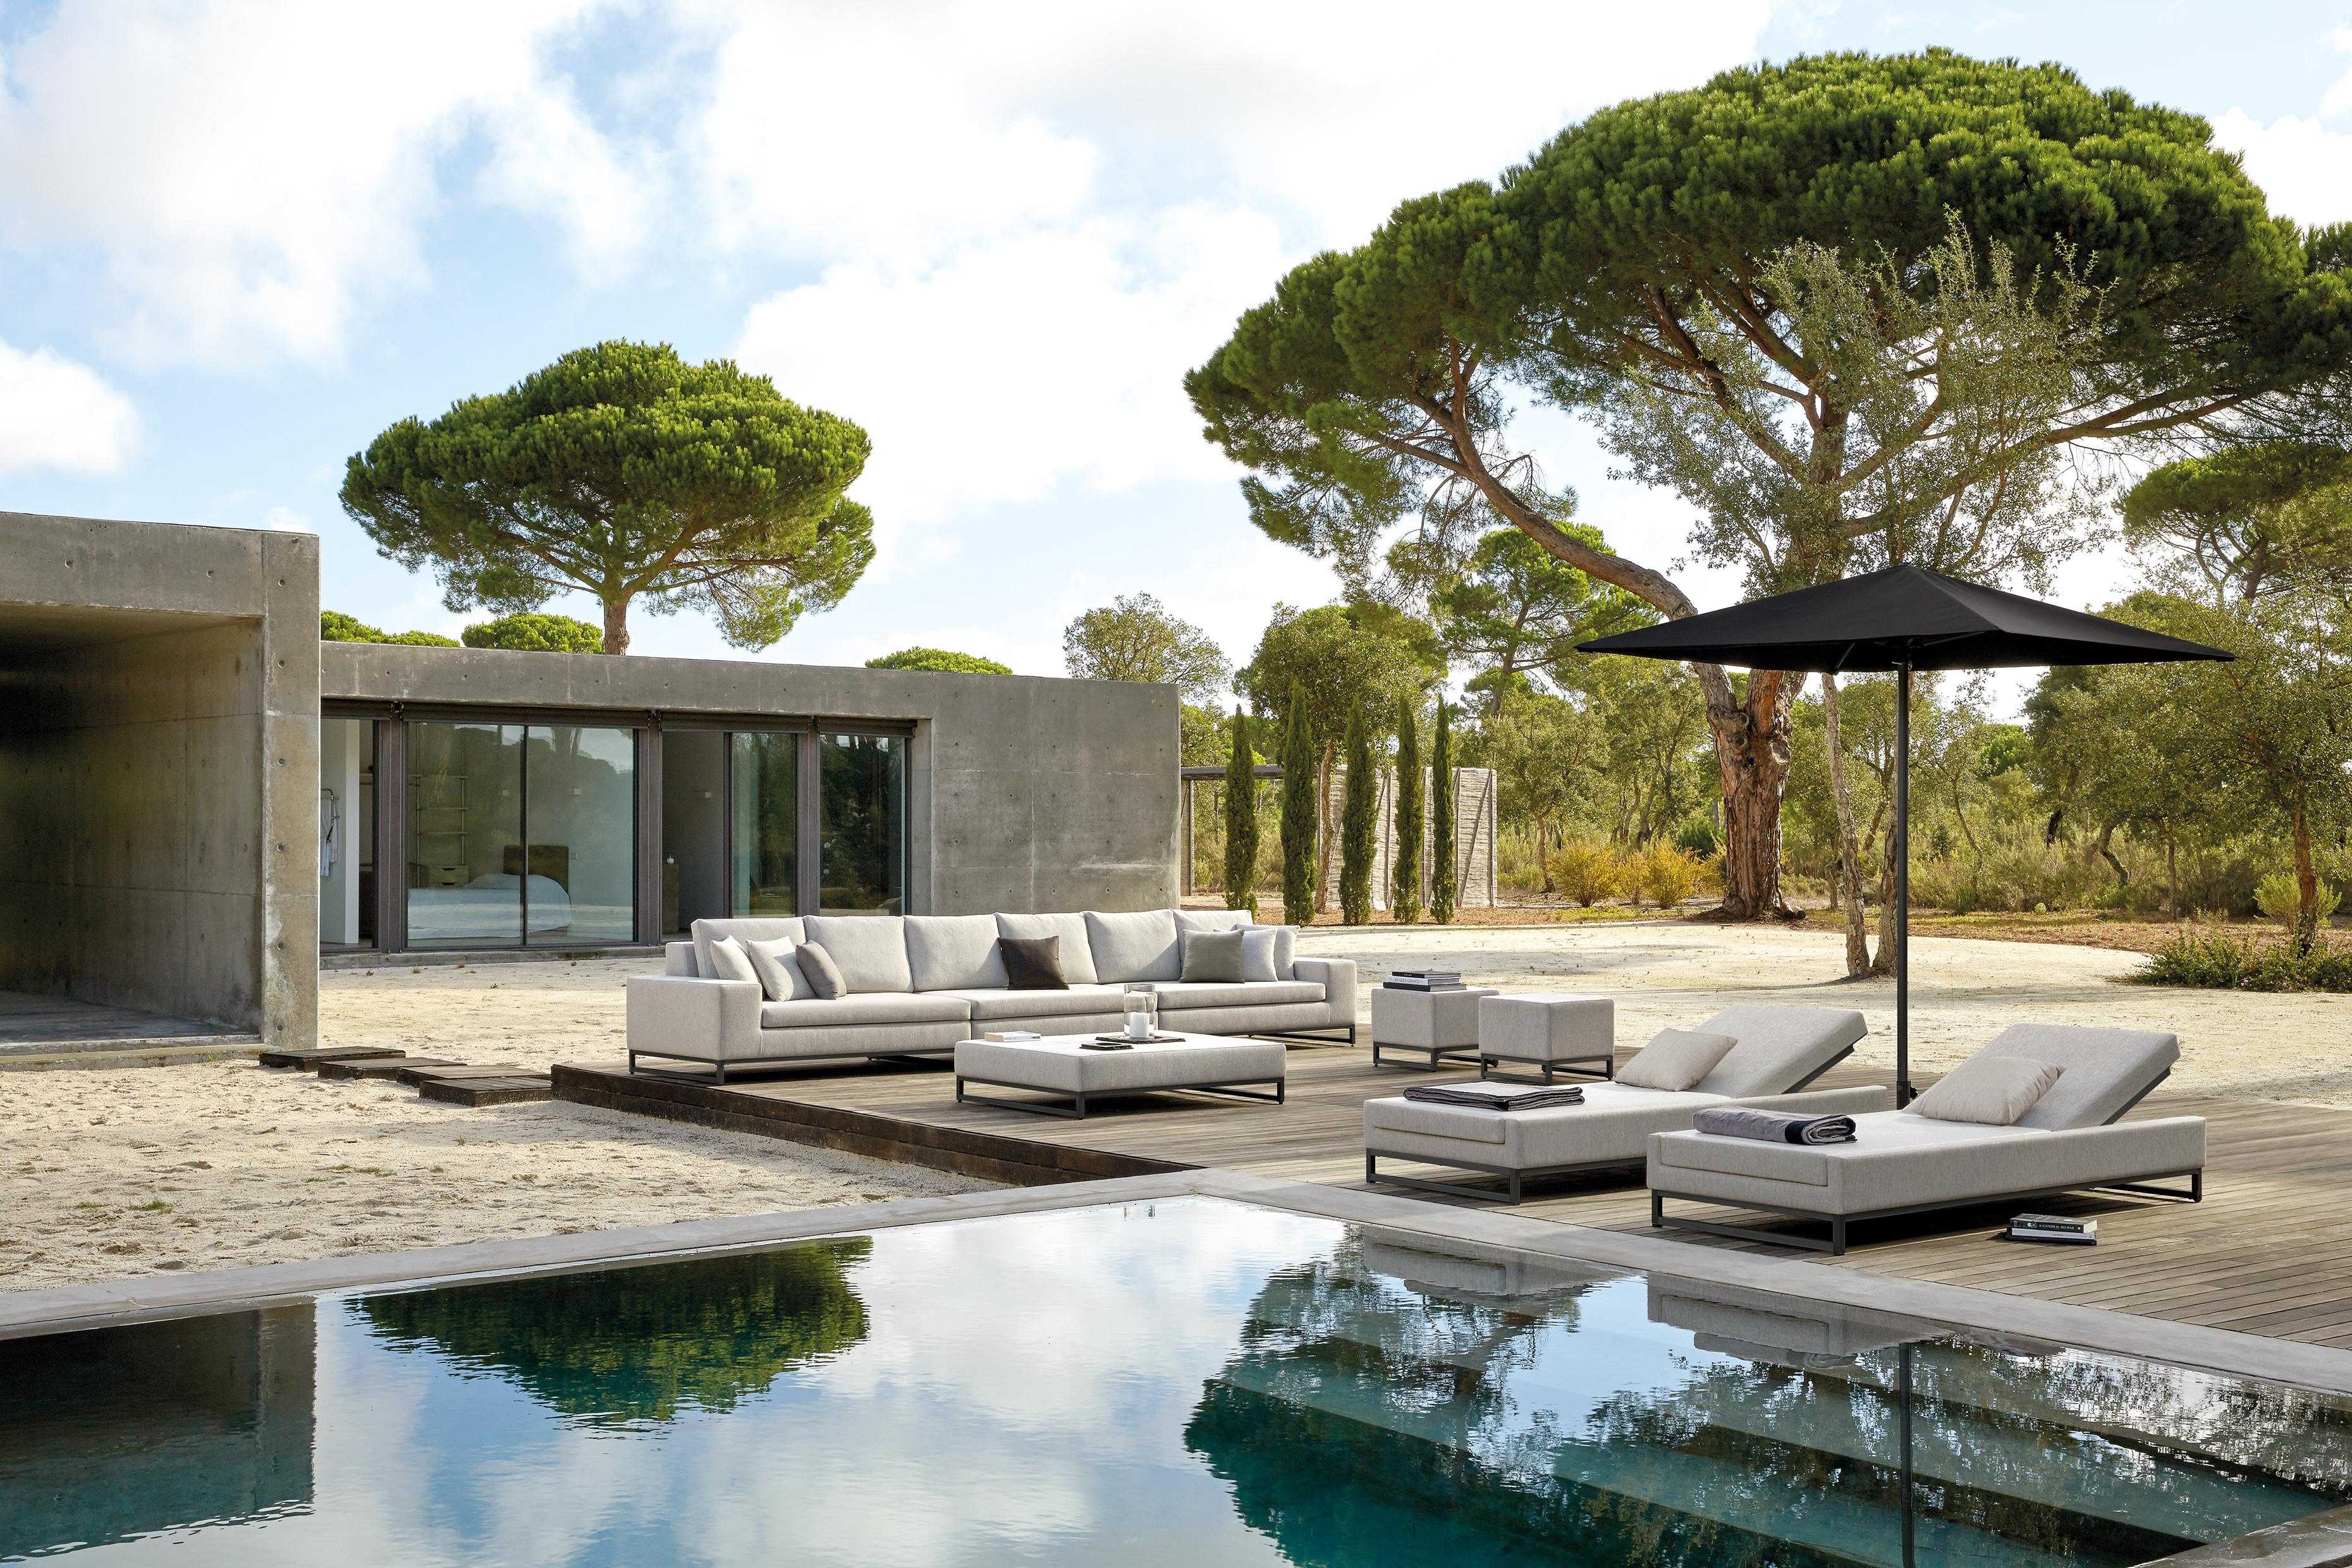 luxury grey contemporary interior design garden furniture set poolside